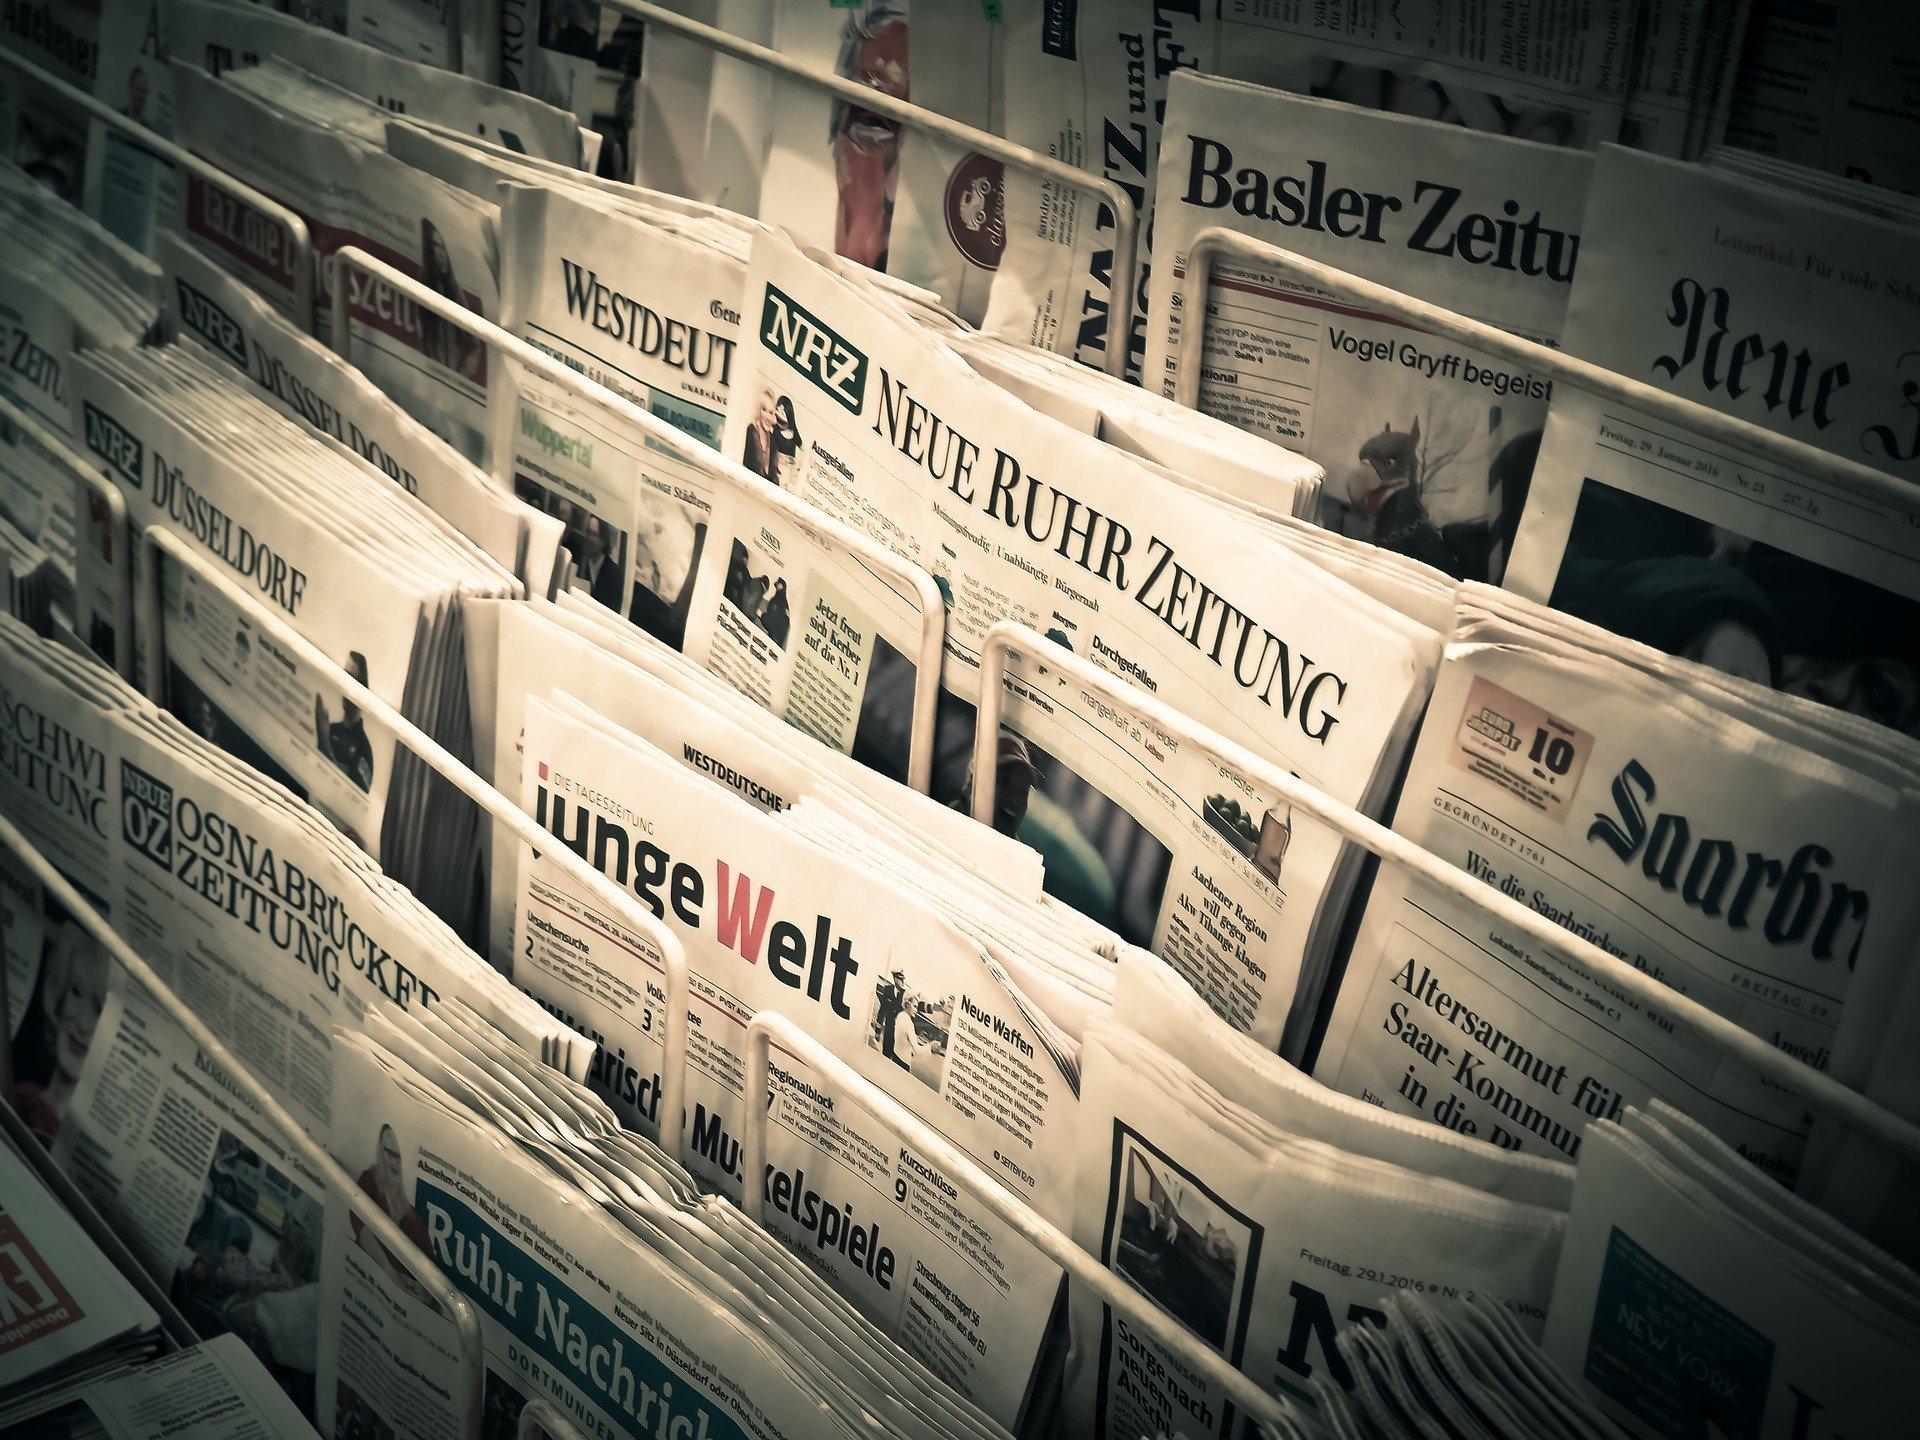 Anaxco Blog Beitrag Bild Zeitung IT-Servies IT-Lösungen IT-Experten Logistik-IT TMS Cloud Datensicherheit